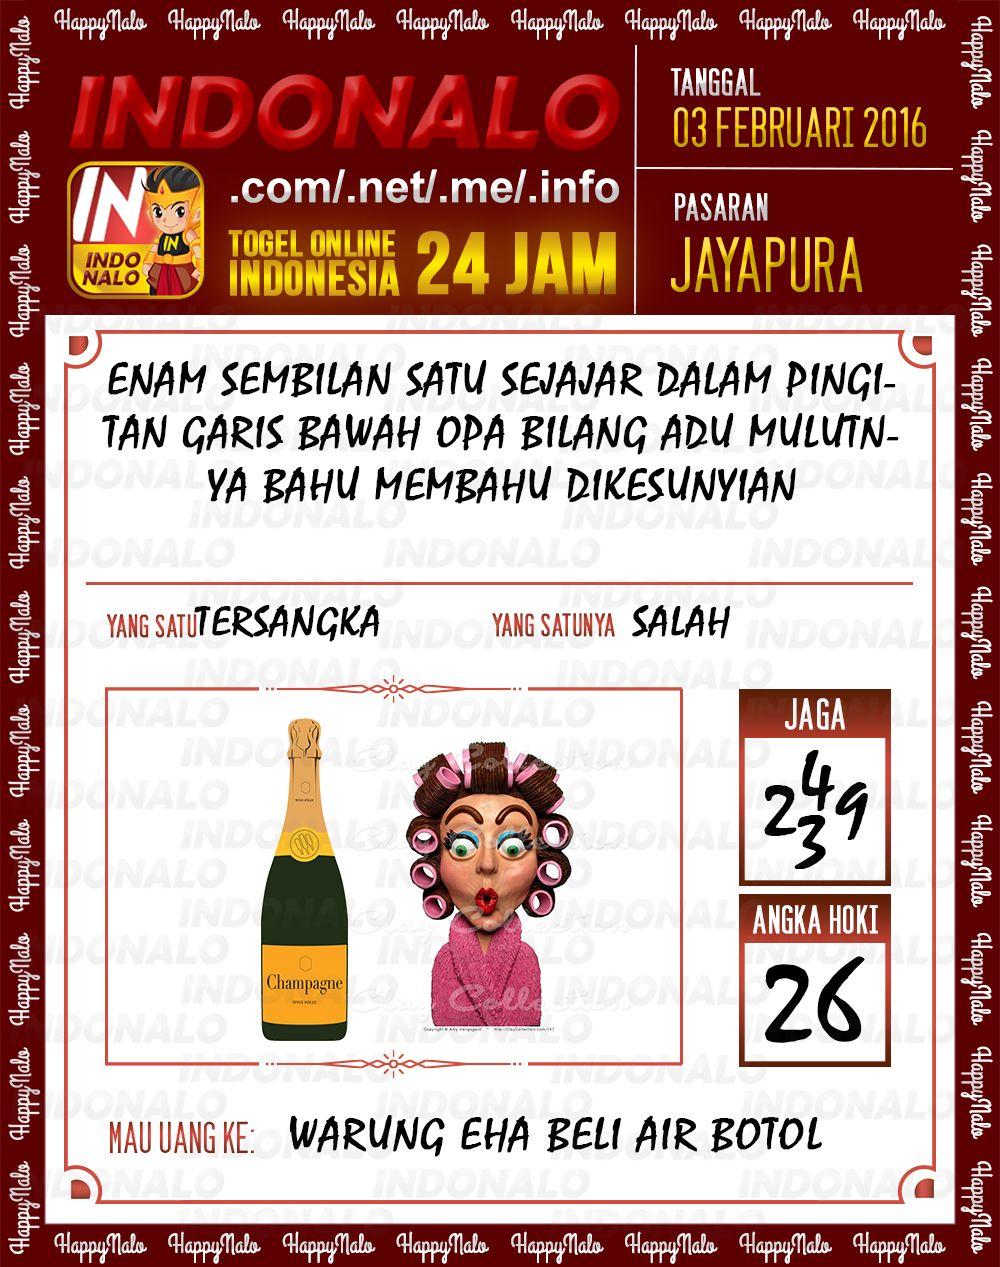 Prediksi Togel Online Indonalo Jayapura 3 Febuari 2016